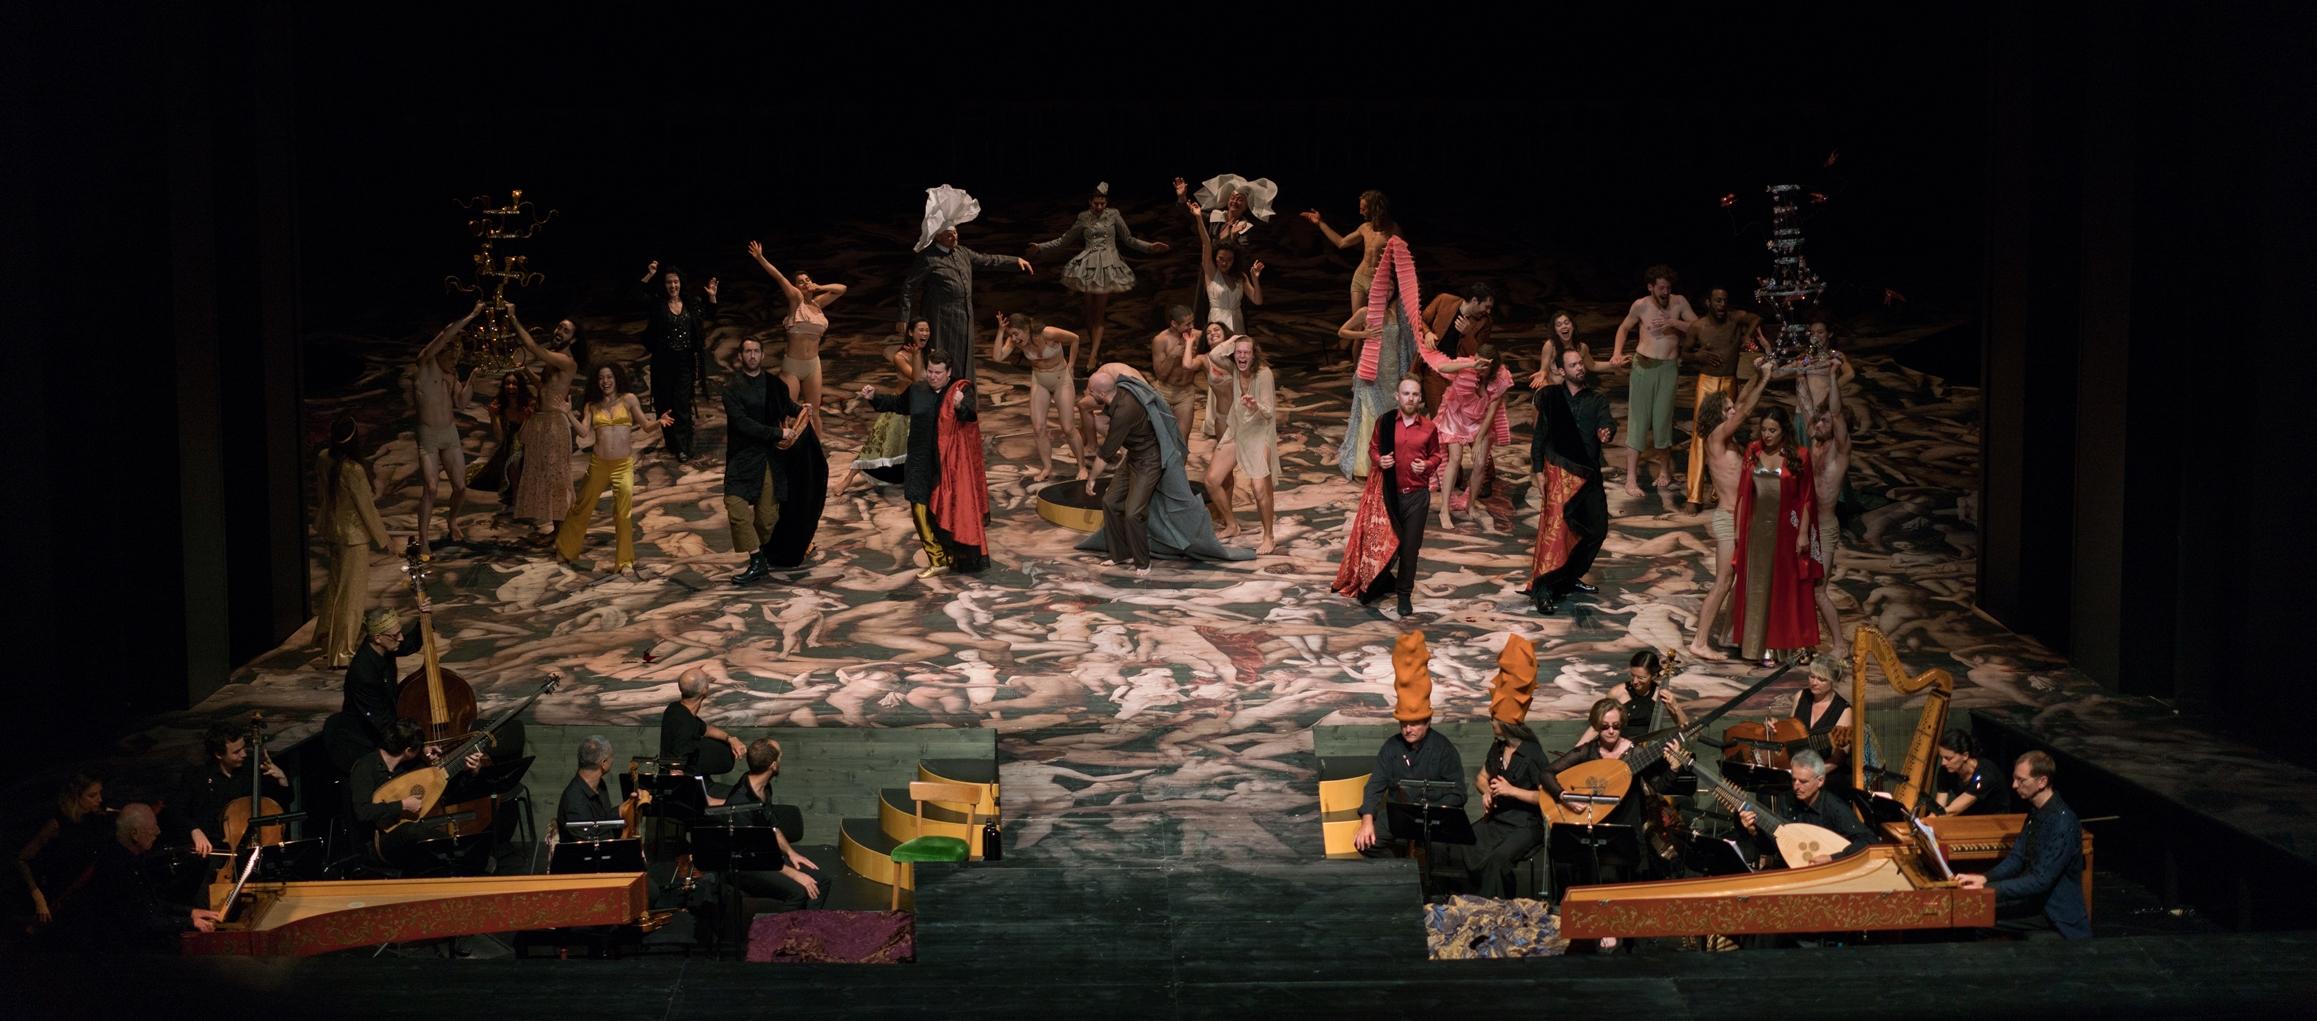 Salzburger Festspiele / Maarten Vanden Abeele